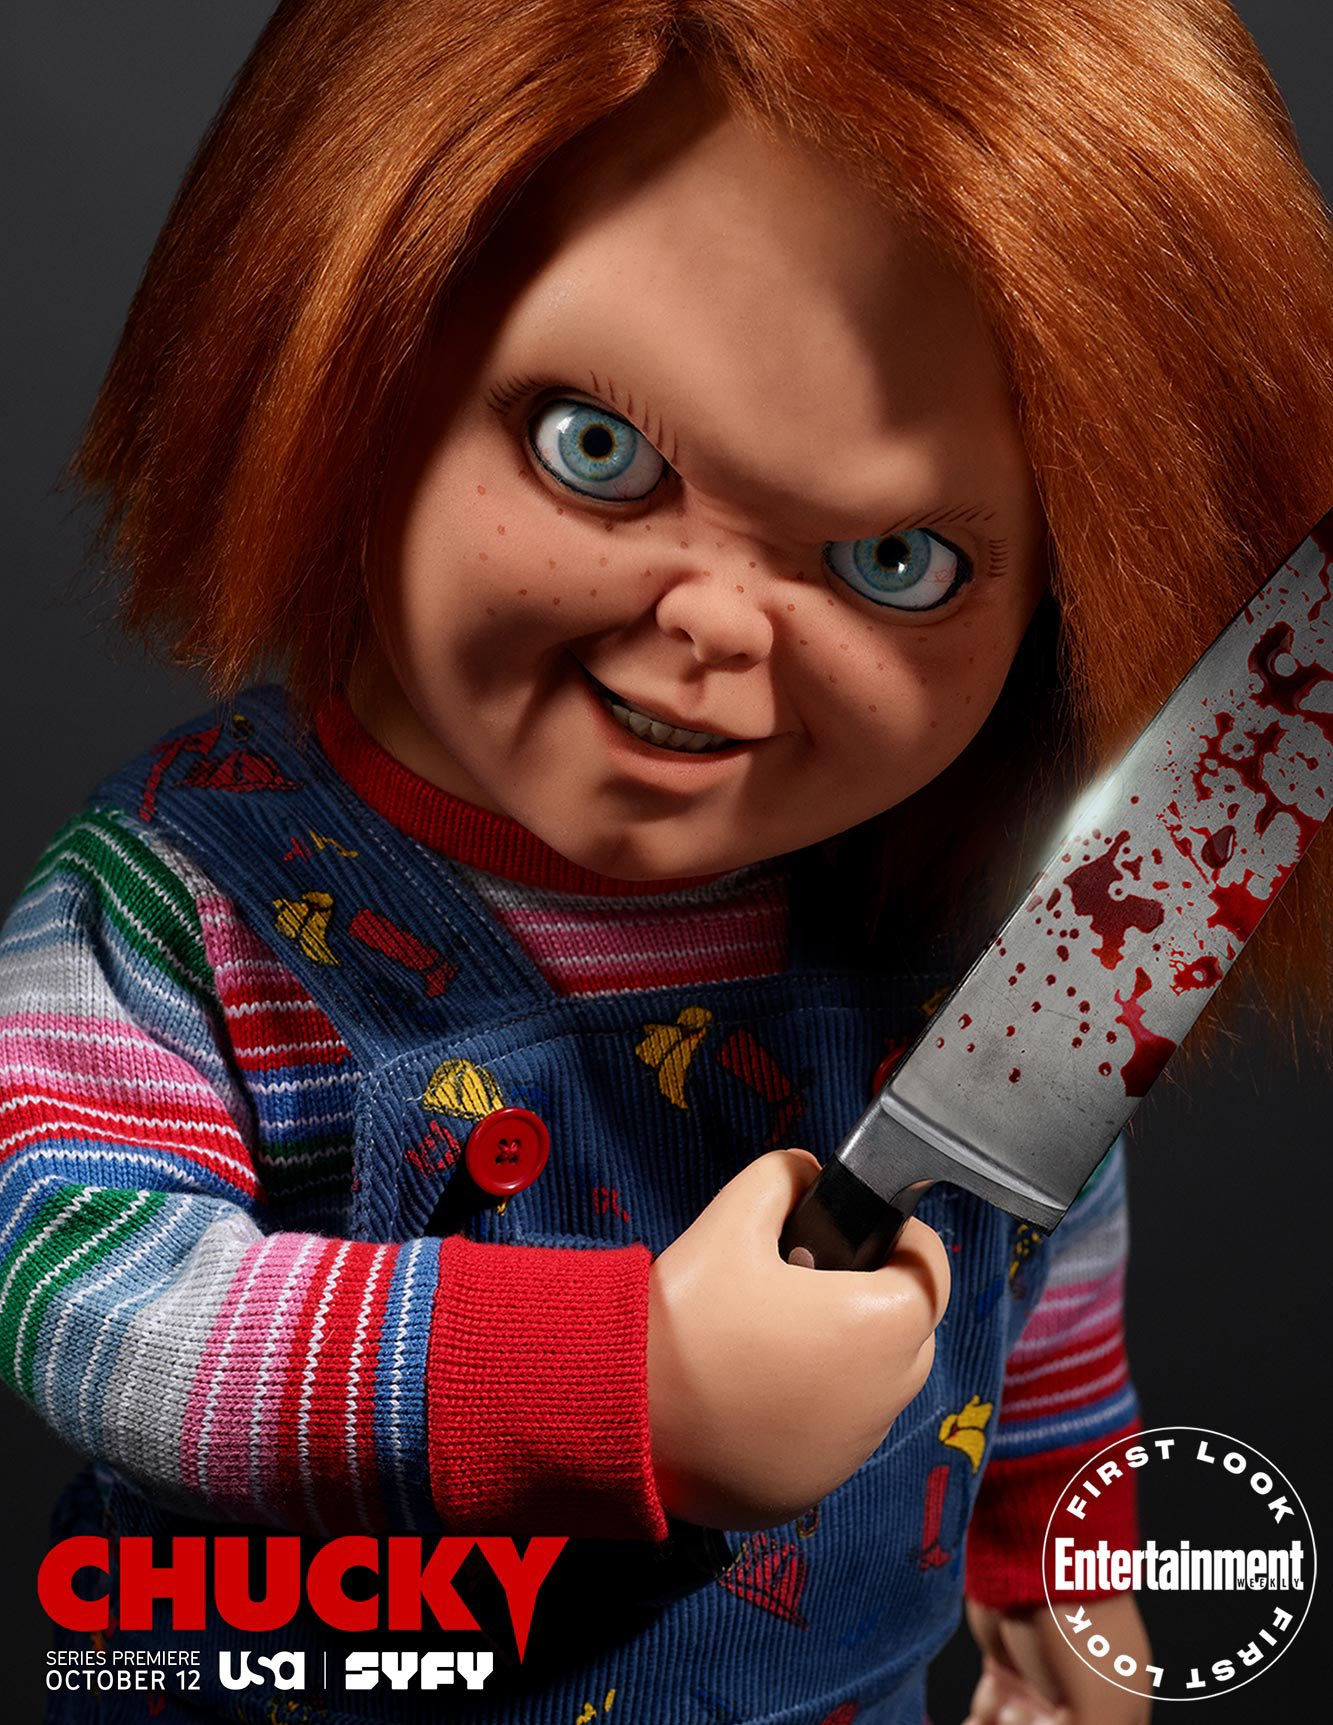 Chucky Official Poter SyFy